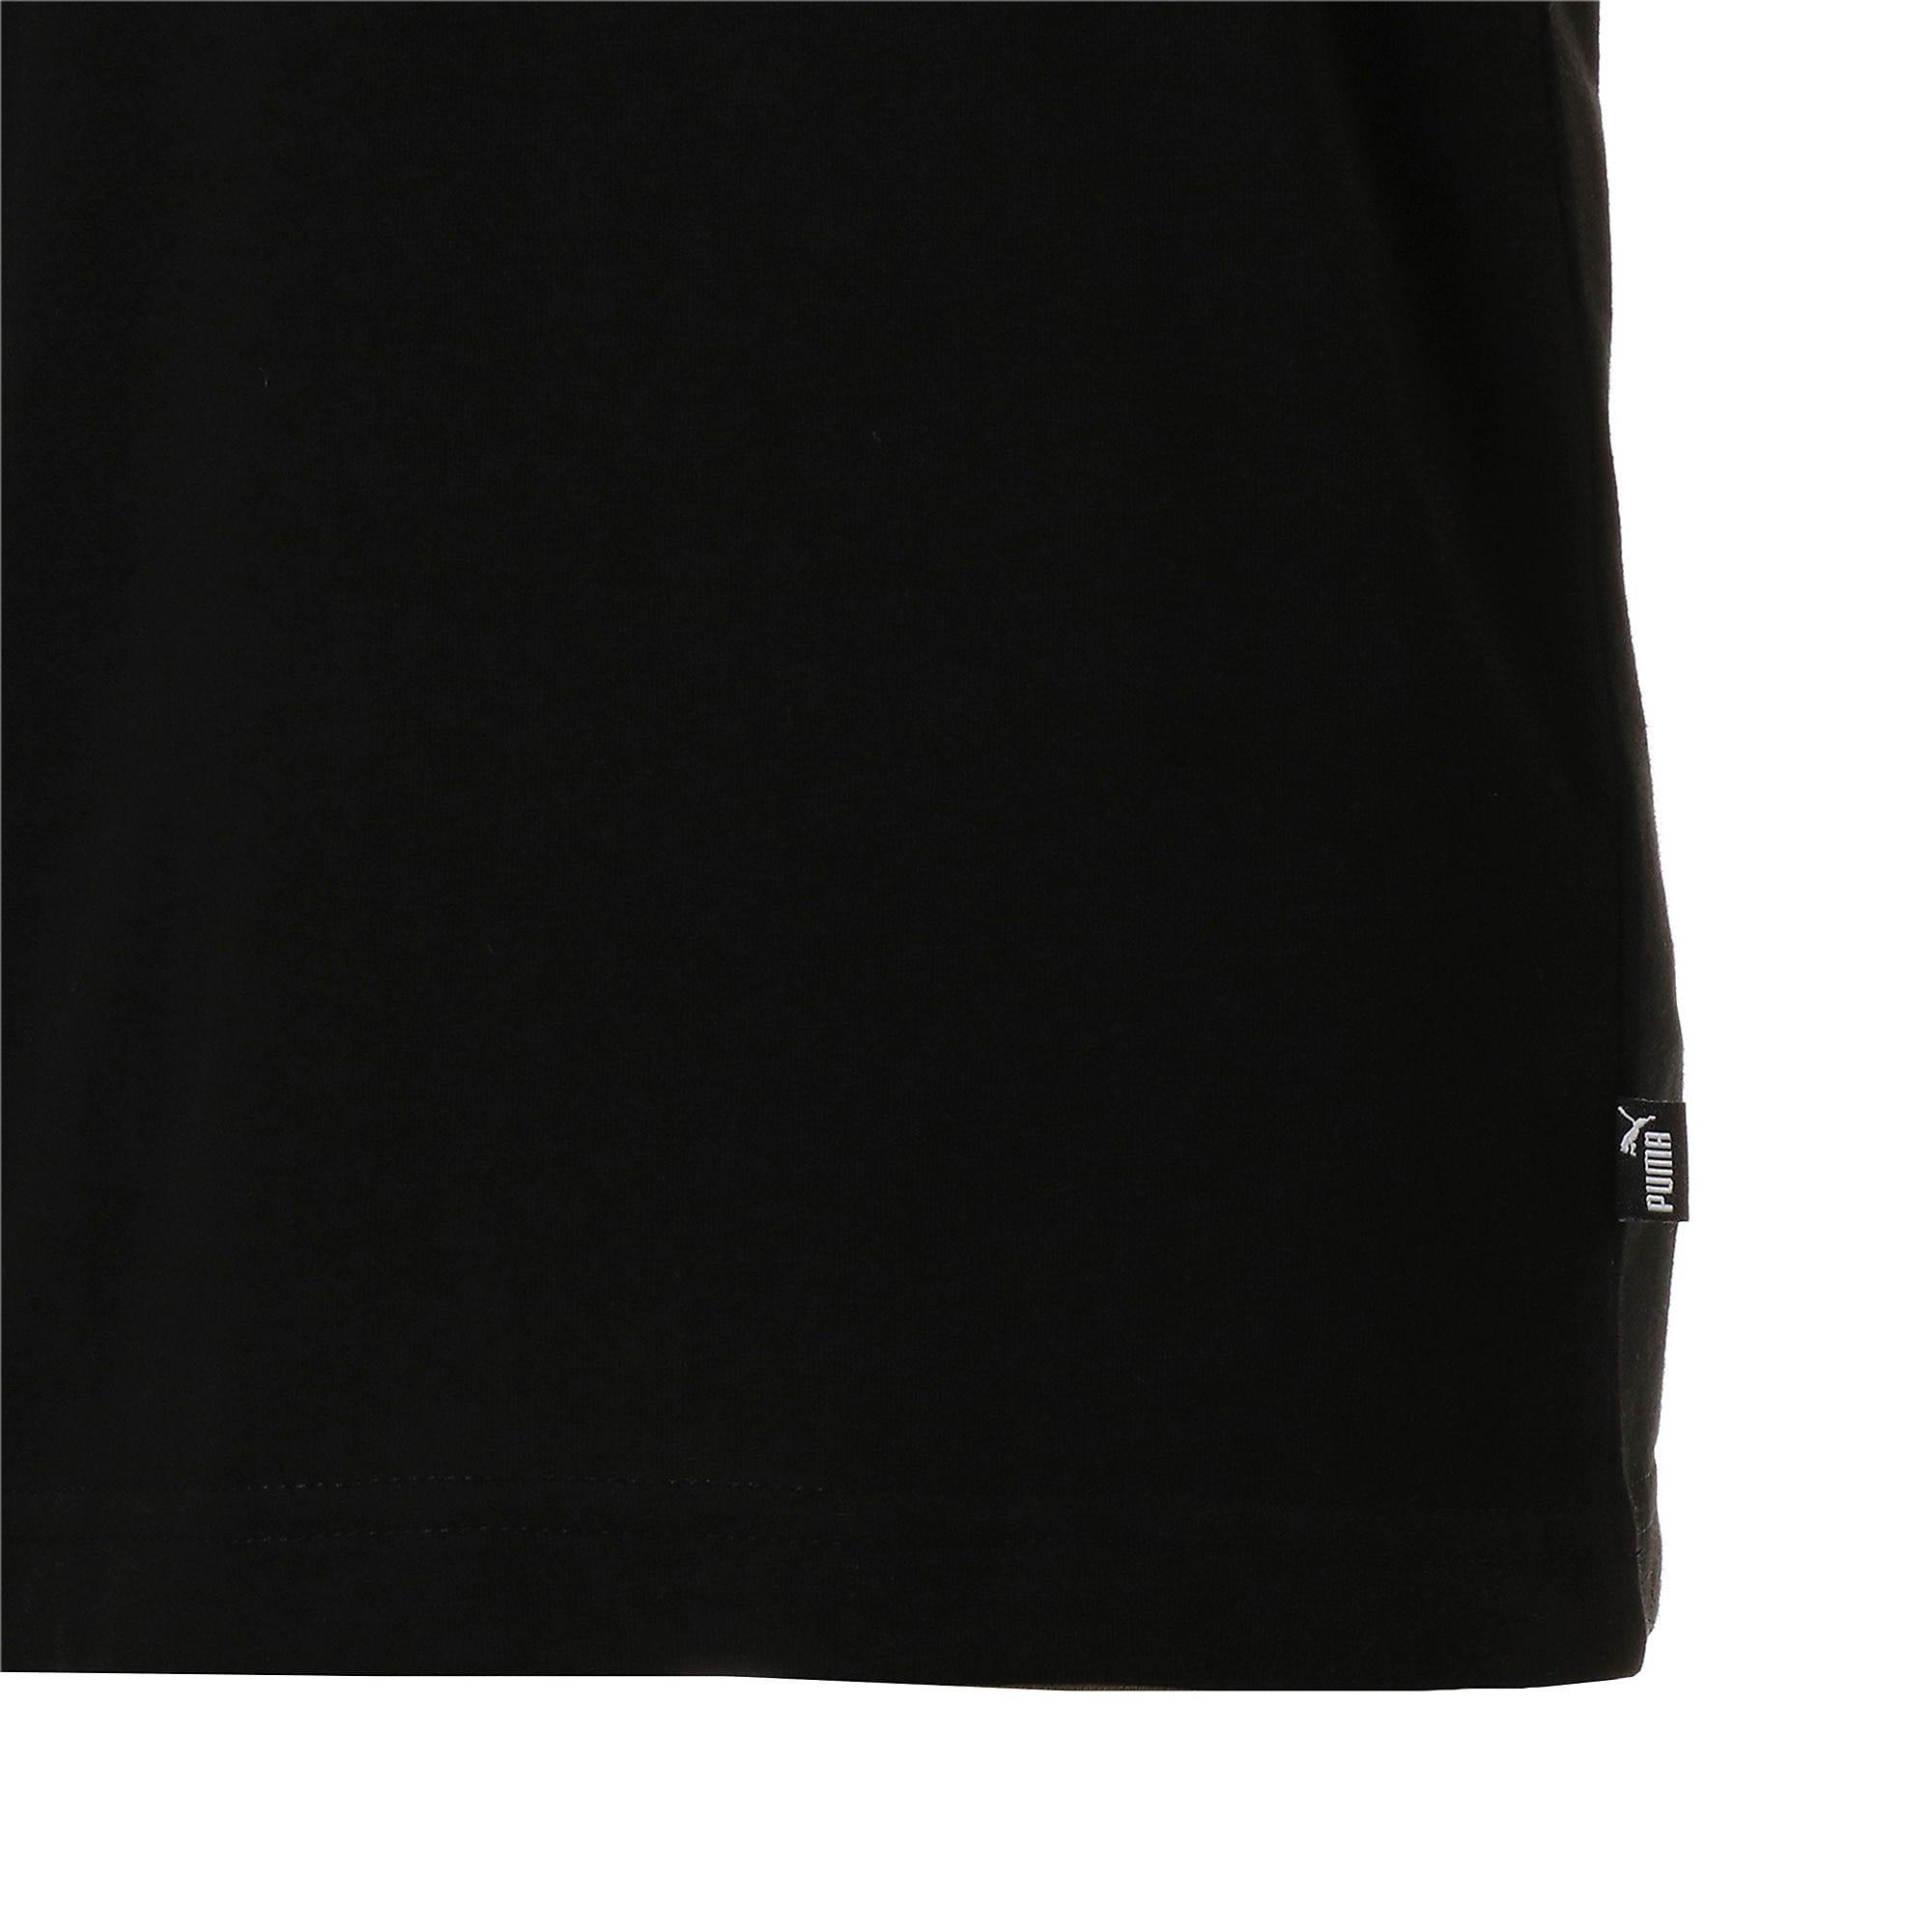 Thumbnail 6 of キッズ シティー 半袖 Tシャツ 2 OSAKA 大阪, Puma Black, medium-JPN